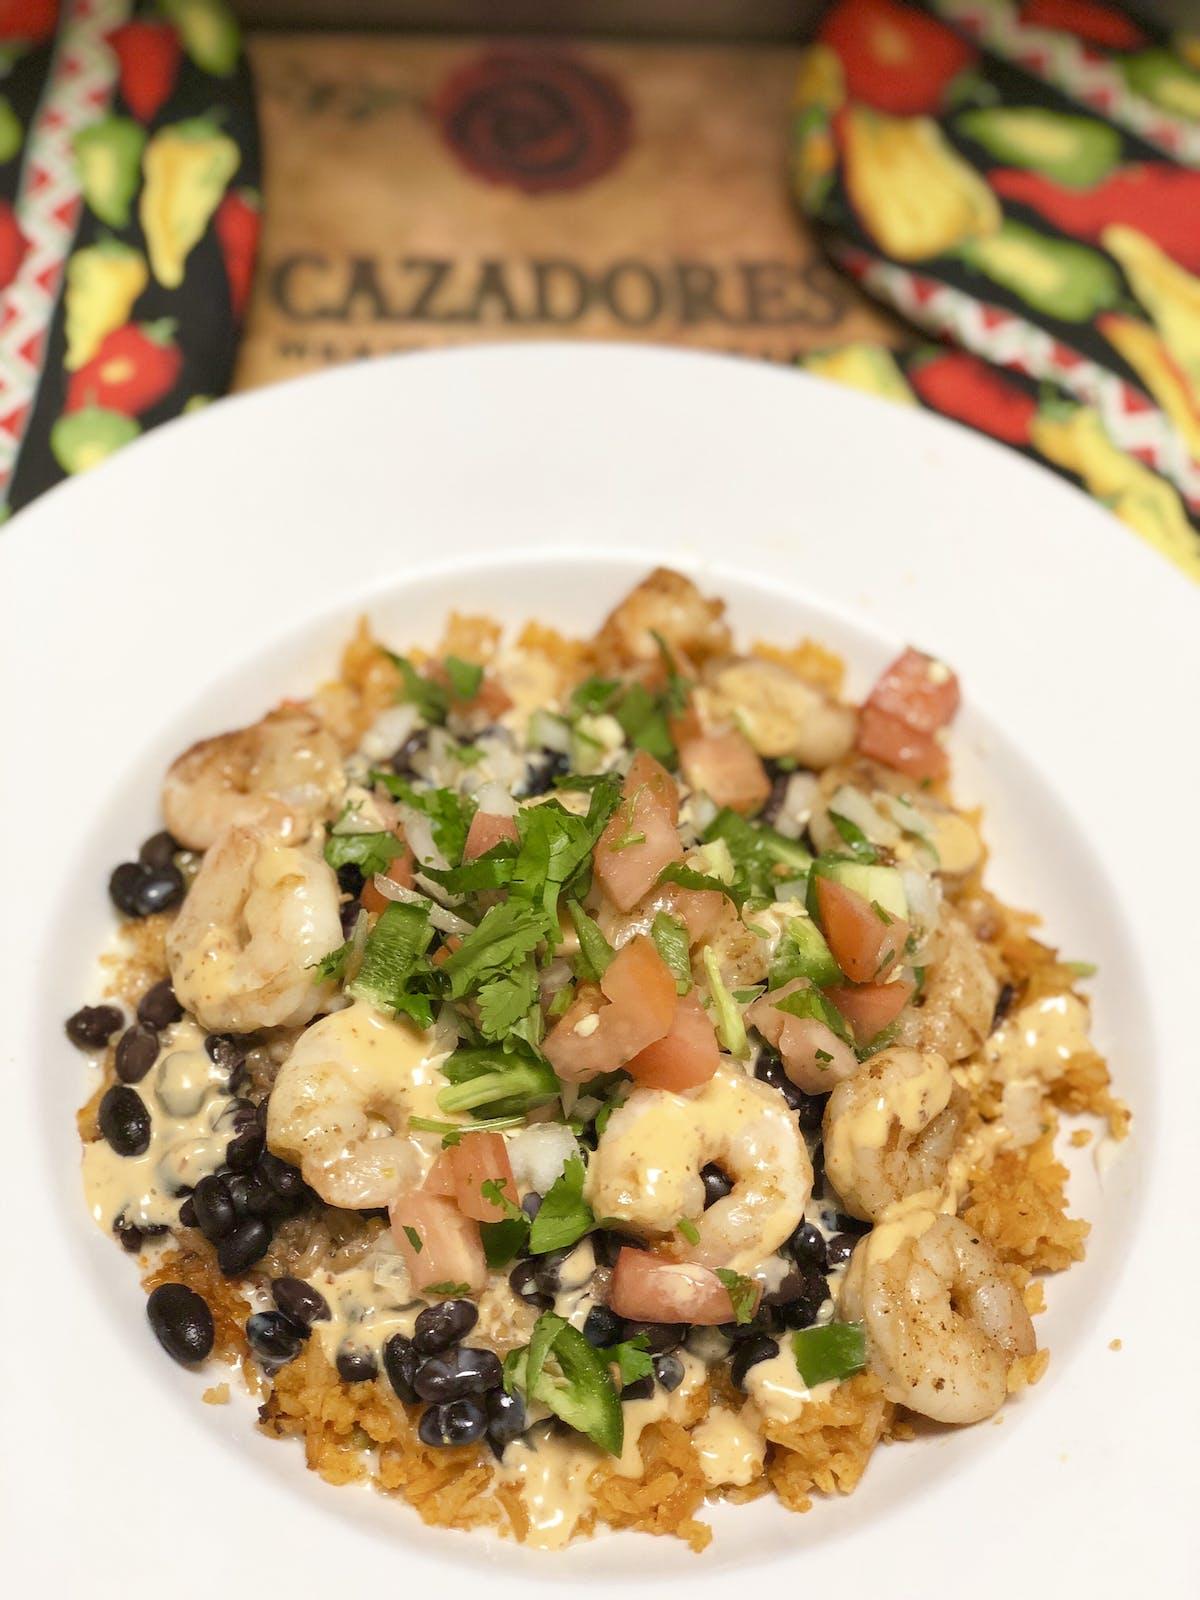 Shrimp salad with beans